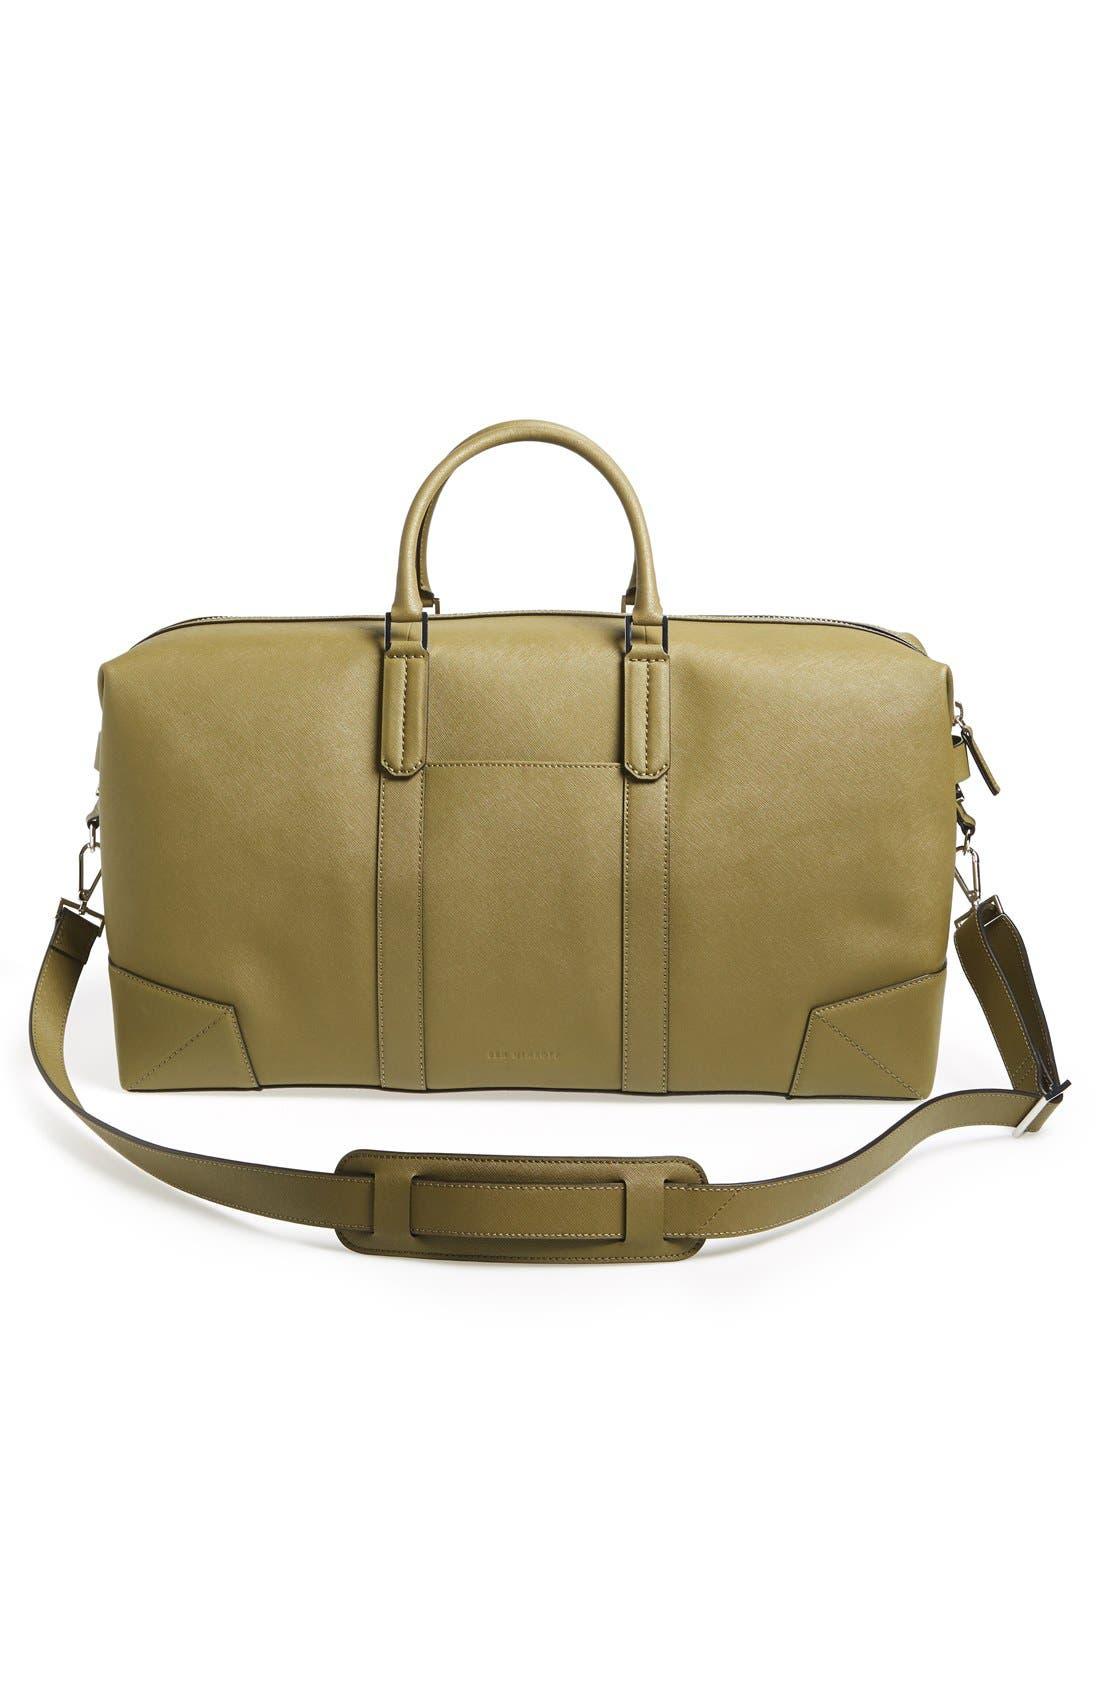 Alternate Image 3  - Ben Minkoff 'Wythe' Weekend Size Saffiano Leather Duffel Bag